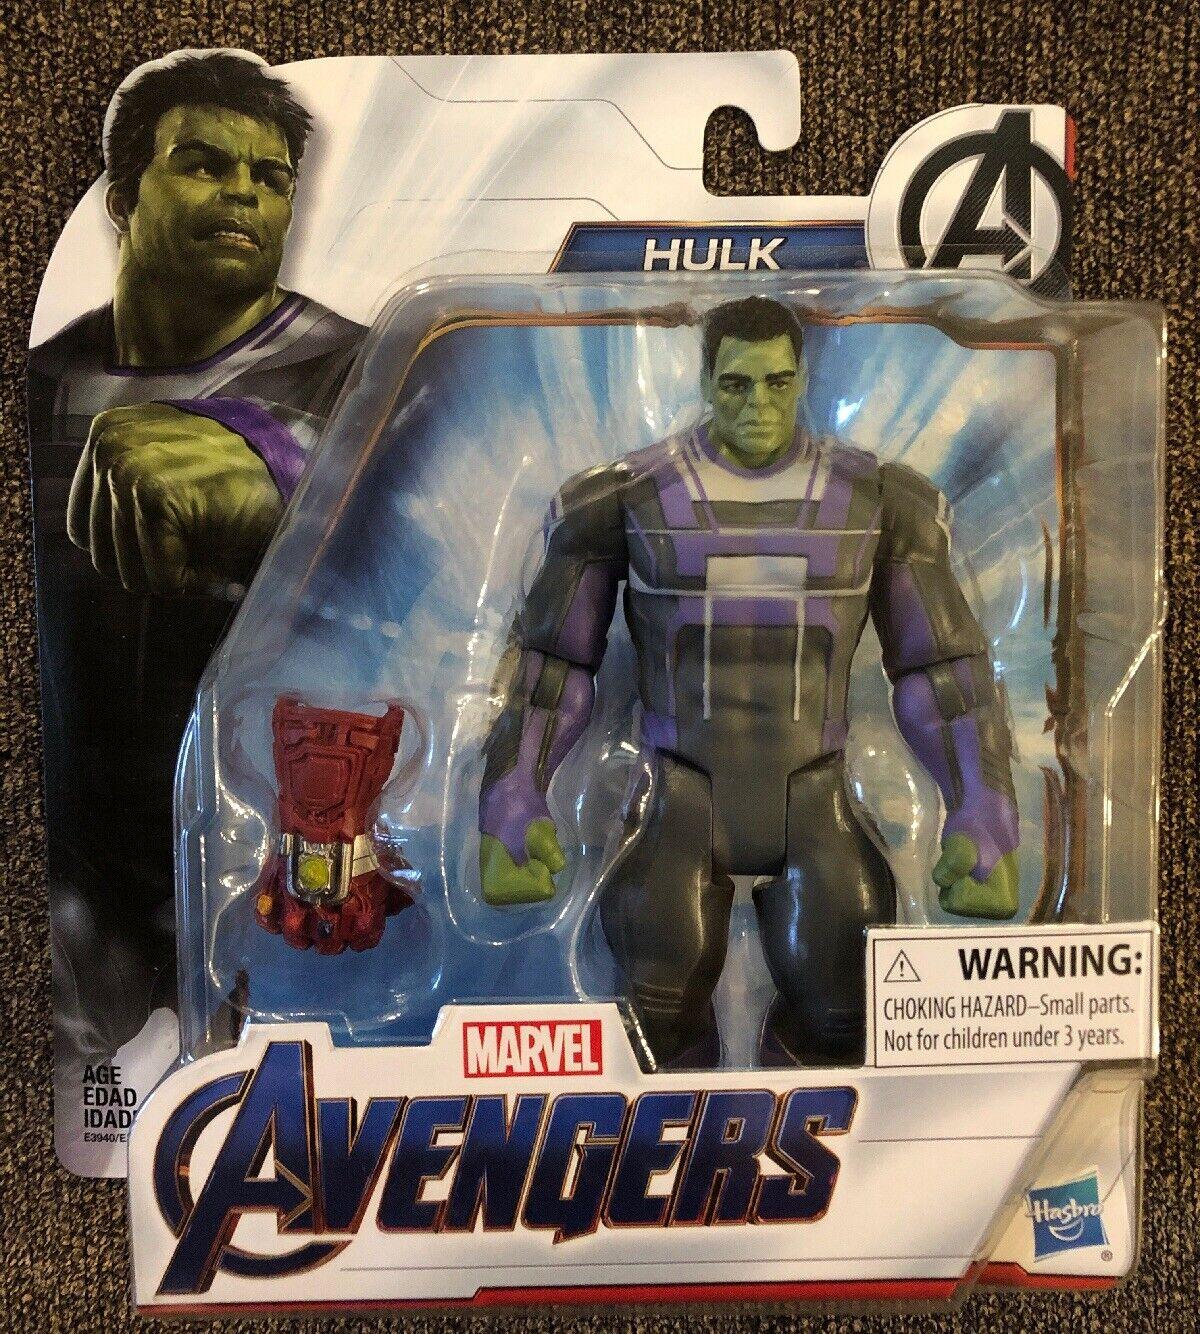 Hasbro Marvel Avengers Endgame Hulk With guantlet Figure Action Figures